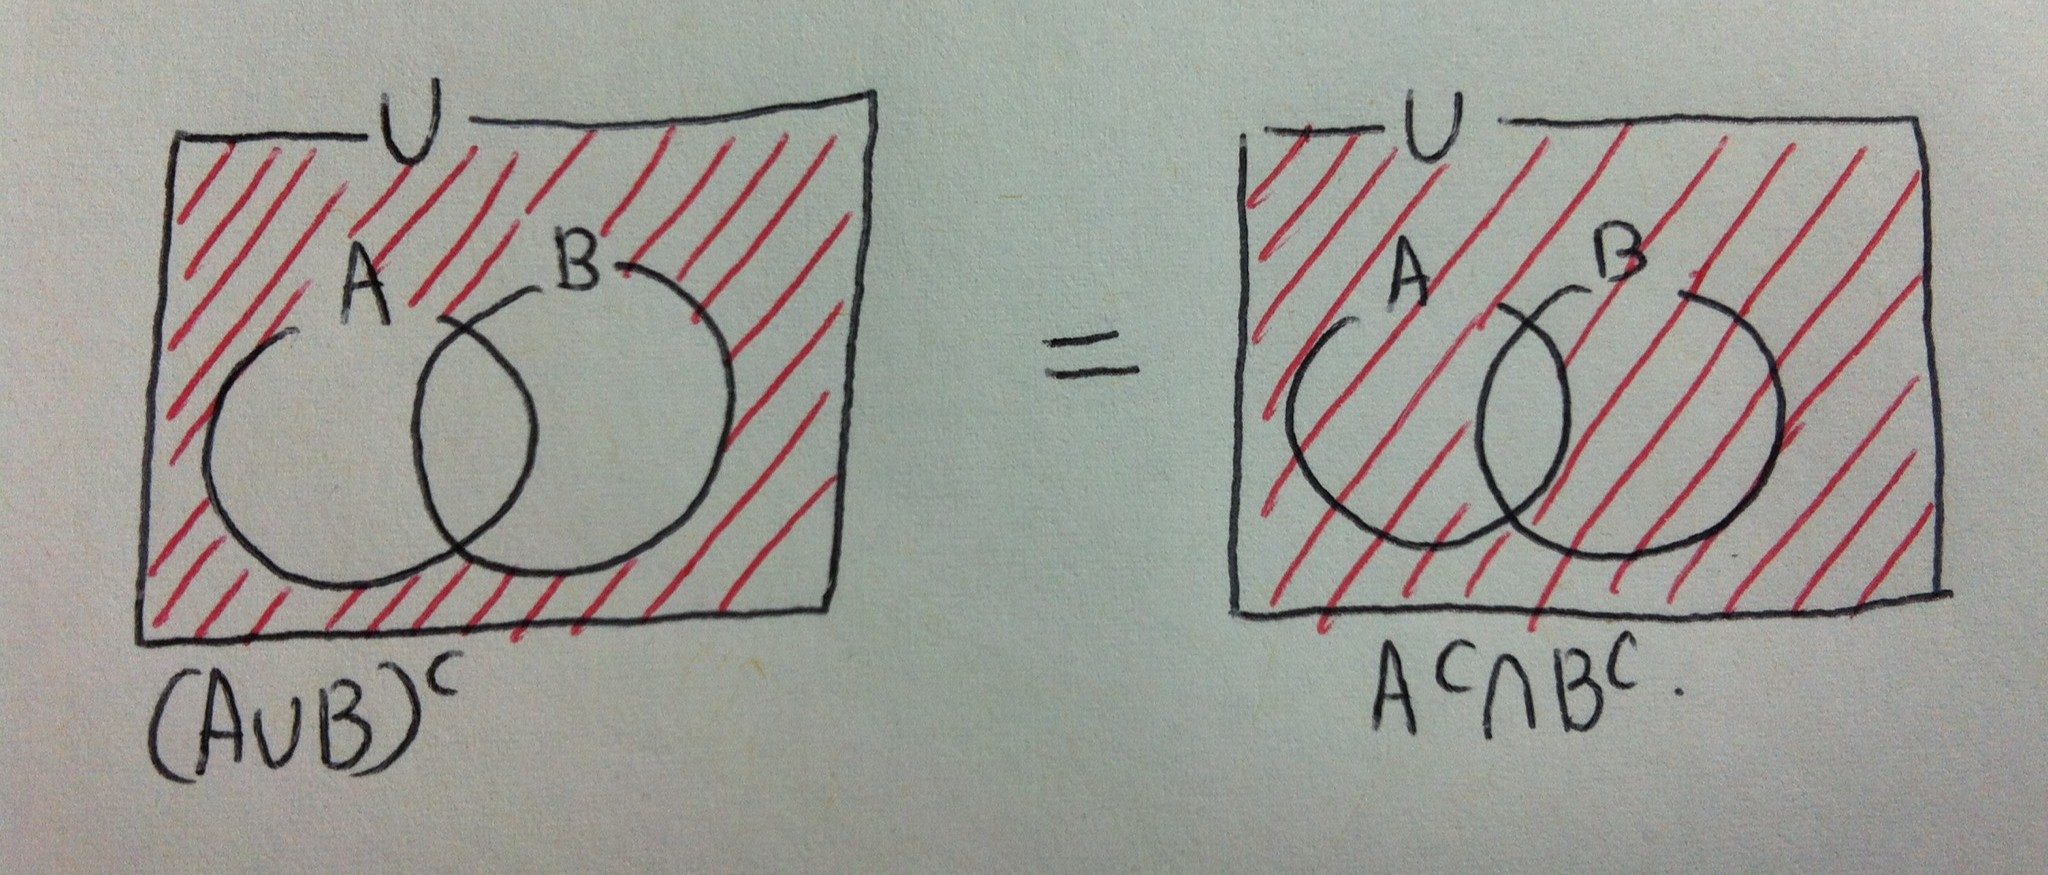 venn diagram to prove de morgan s law venn image chapter 5 sookyung mdm4u on venn diagram to prove de morgan s law